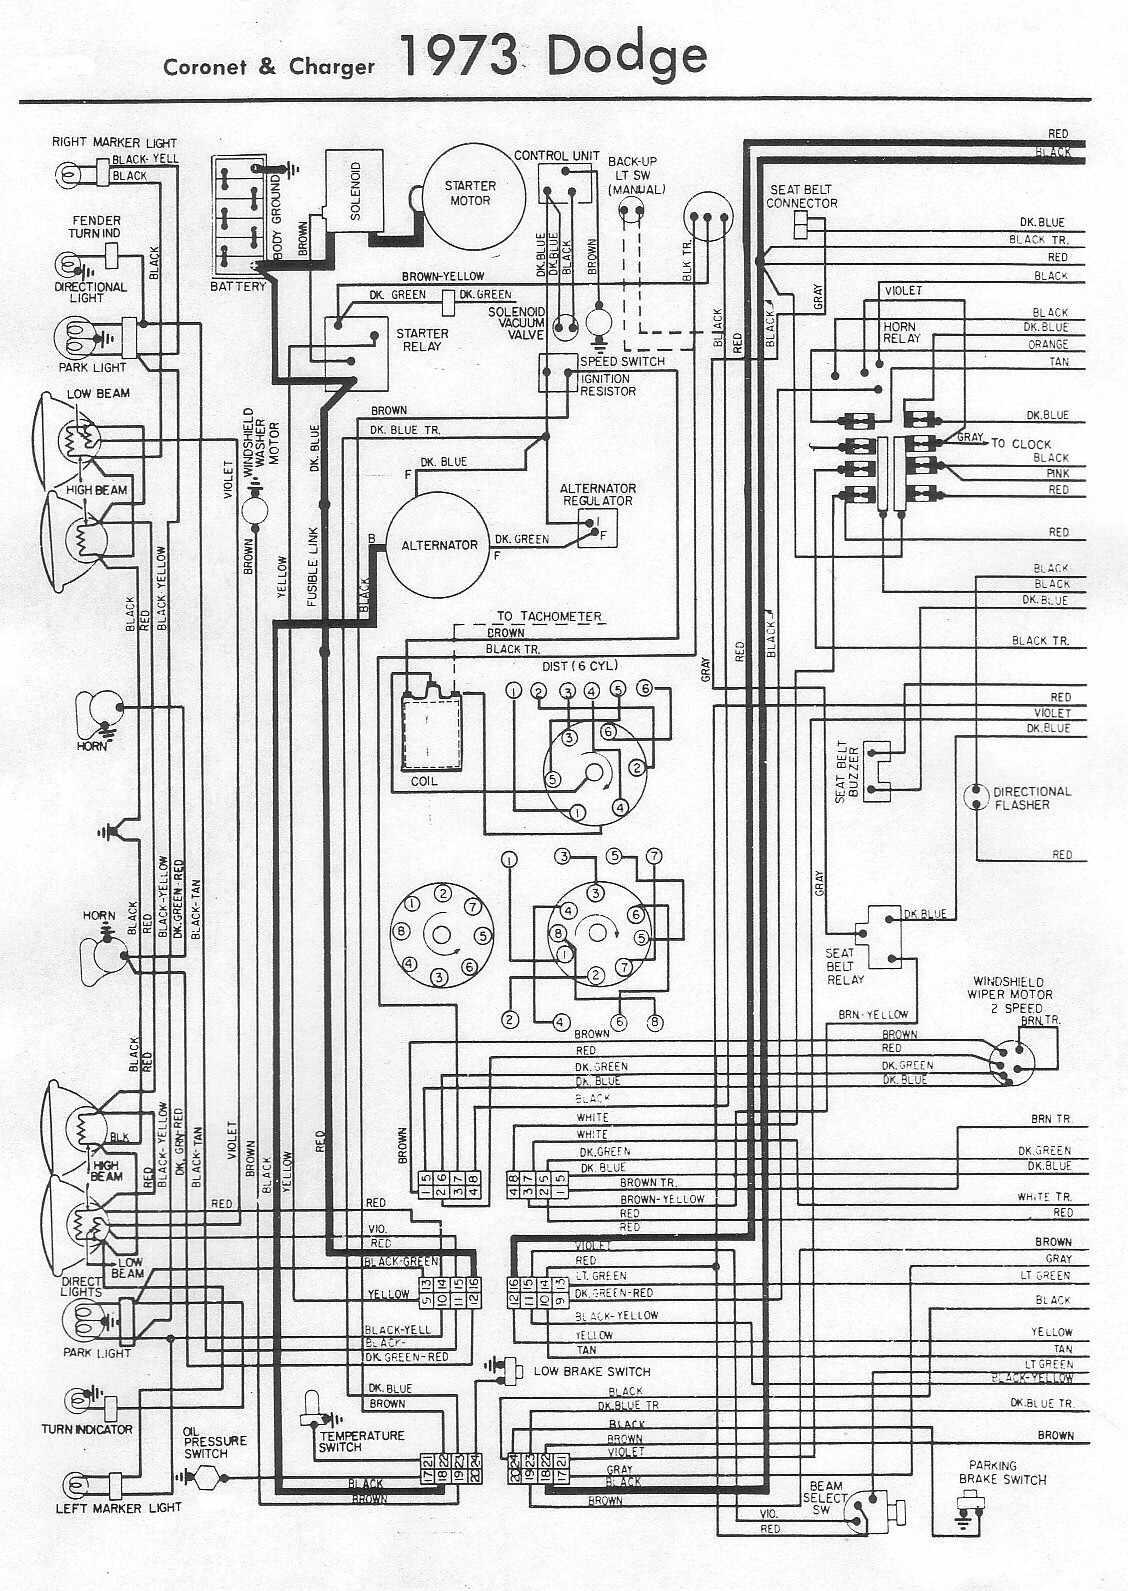 jawa wiring diagram wiring library. Black Bedroom Furniture Sets. Home Design Ideas